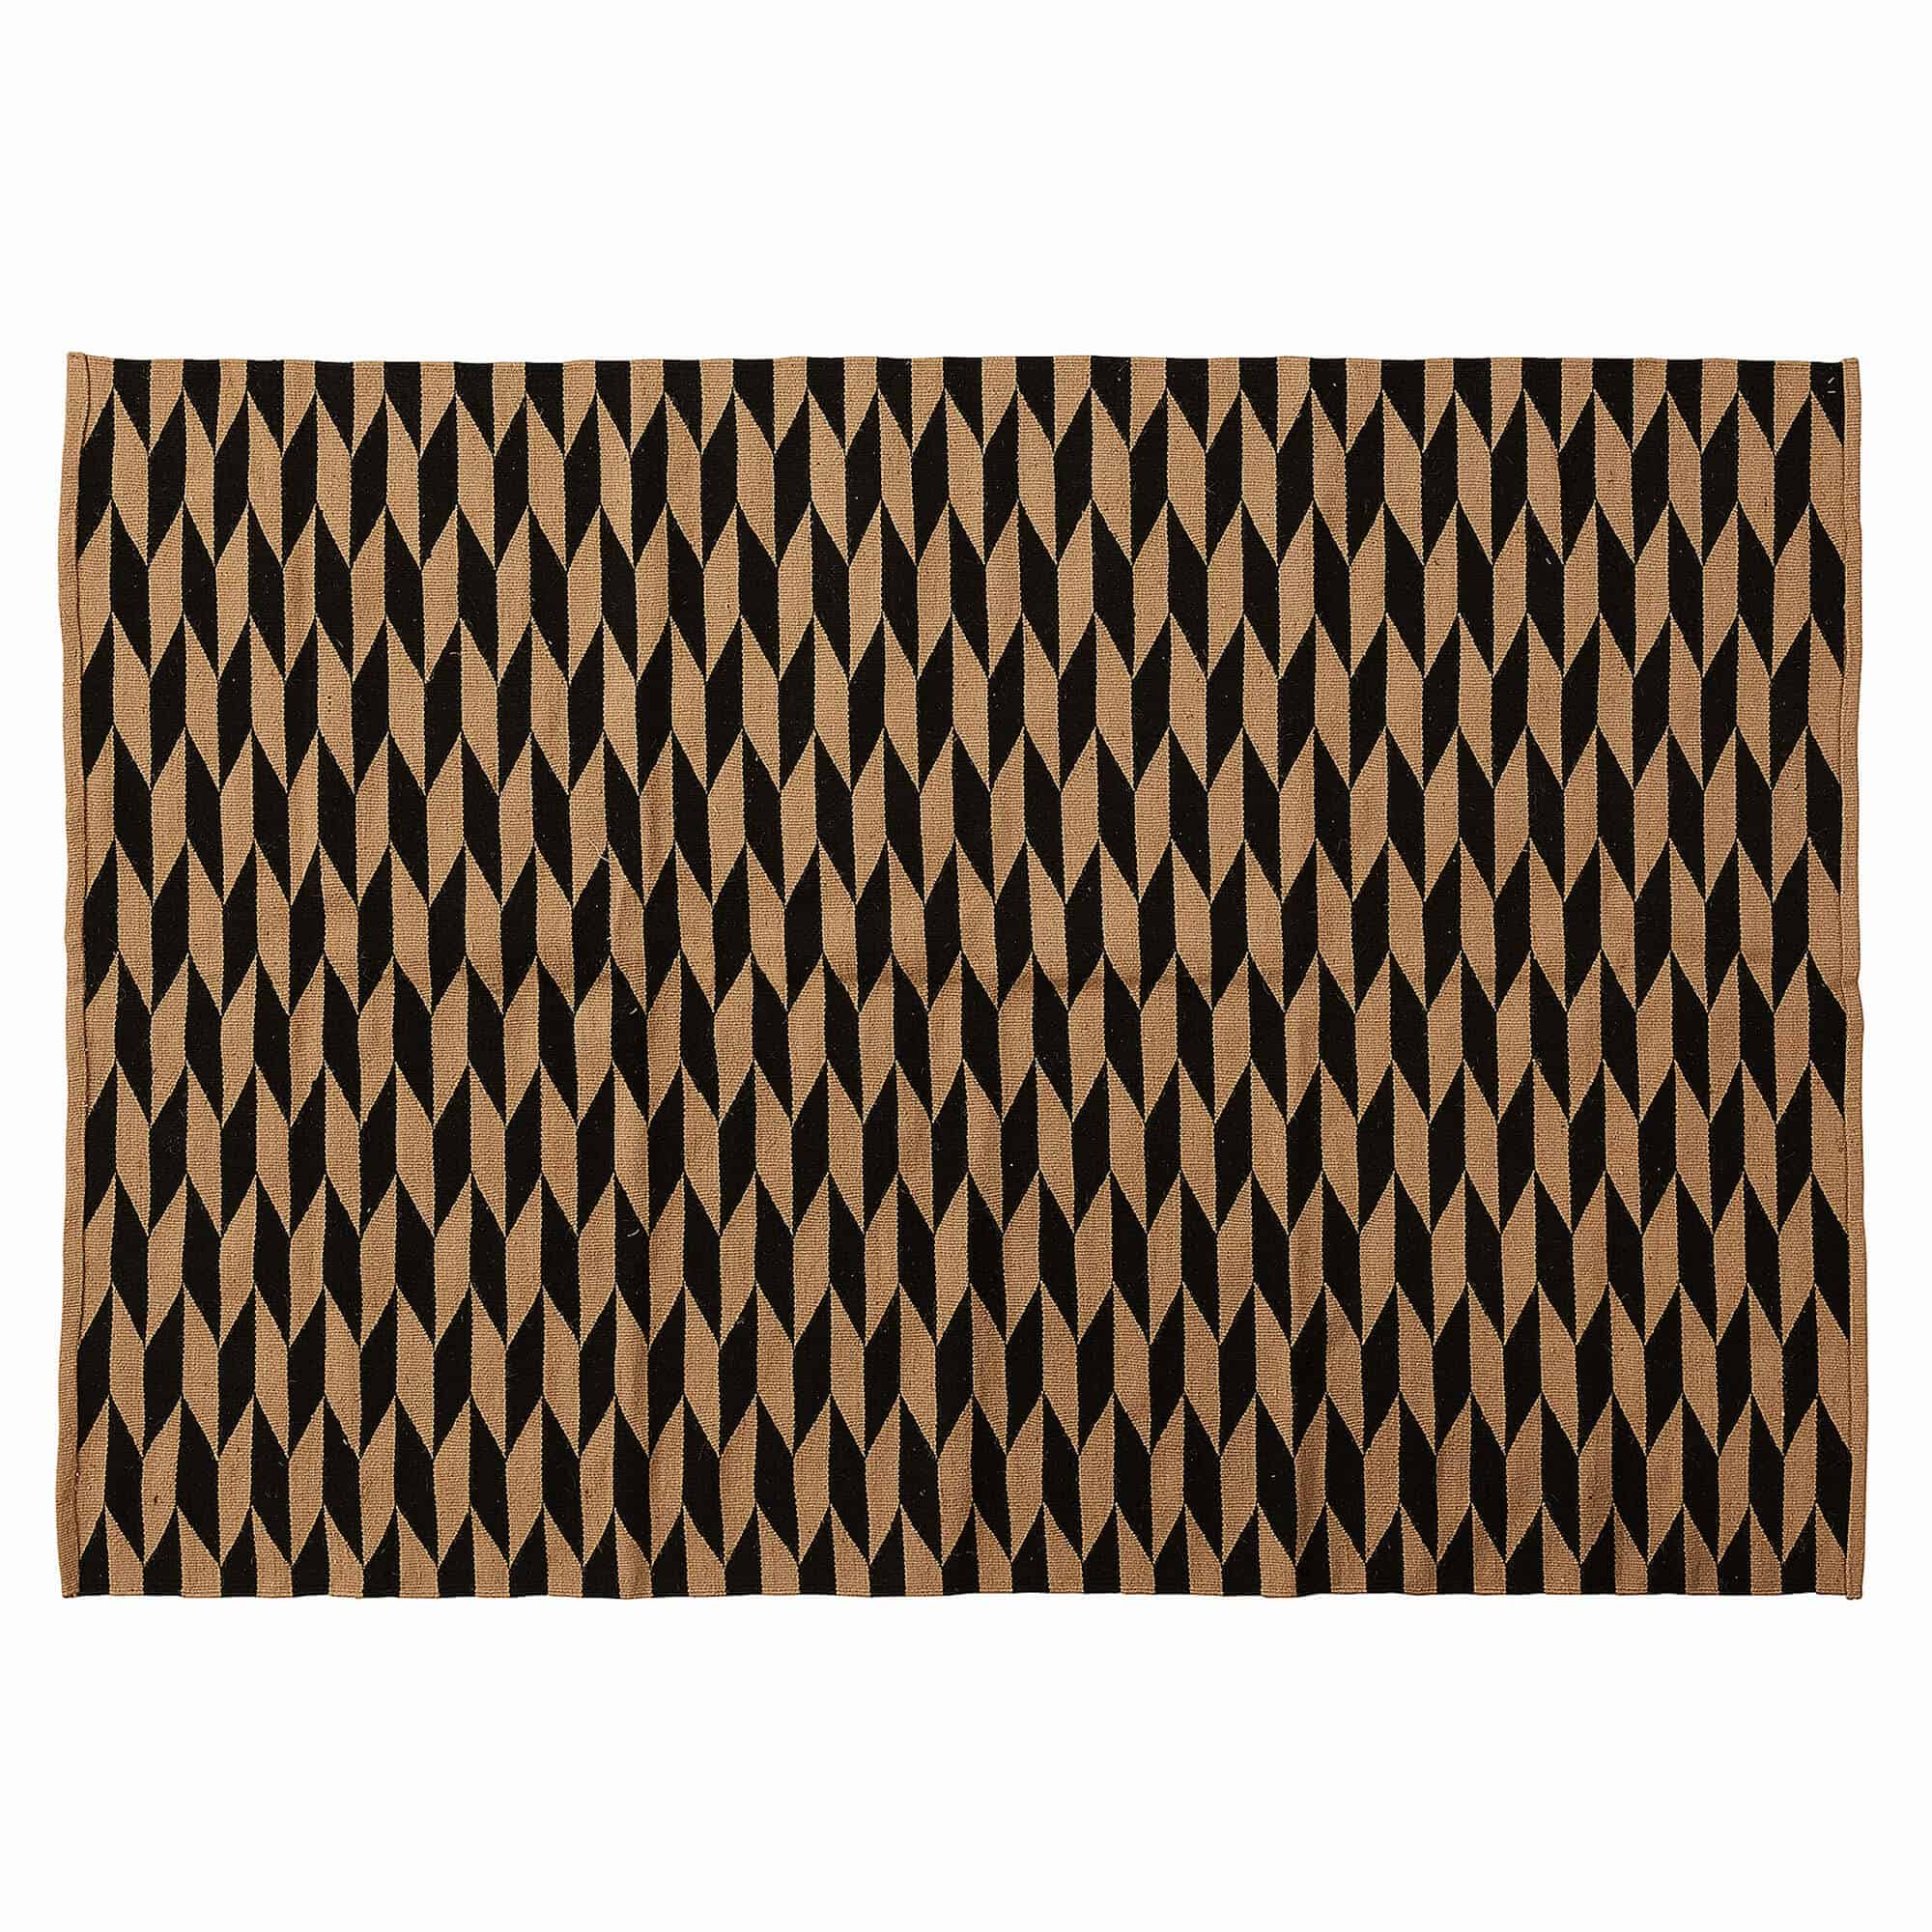 Laforma capsule gulvtæppe - natur/sort jute/bomuld, rektangulær (230x160) fra laforma på boboonline.dk